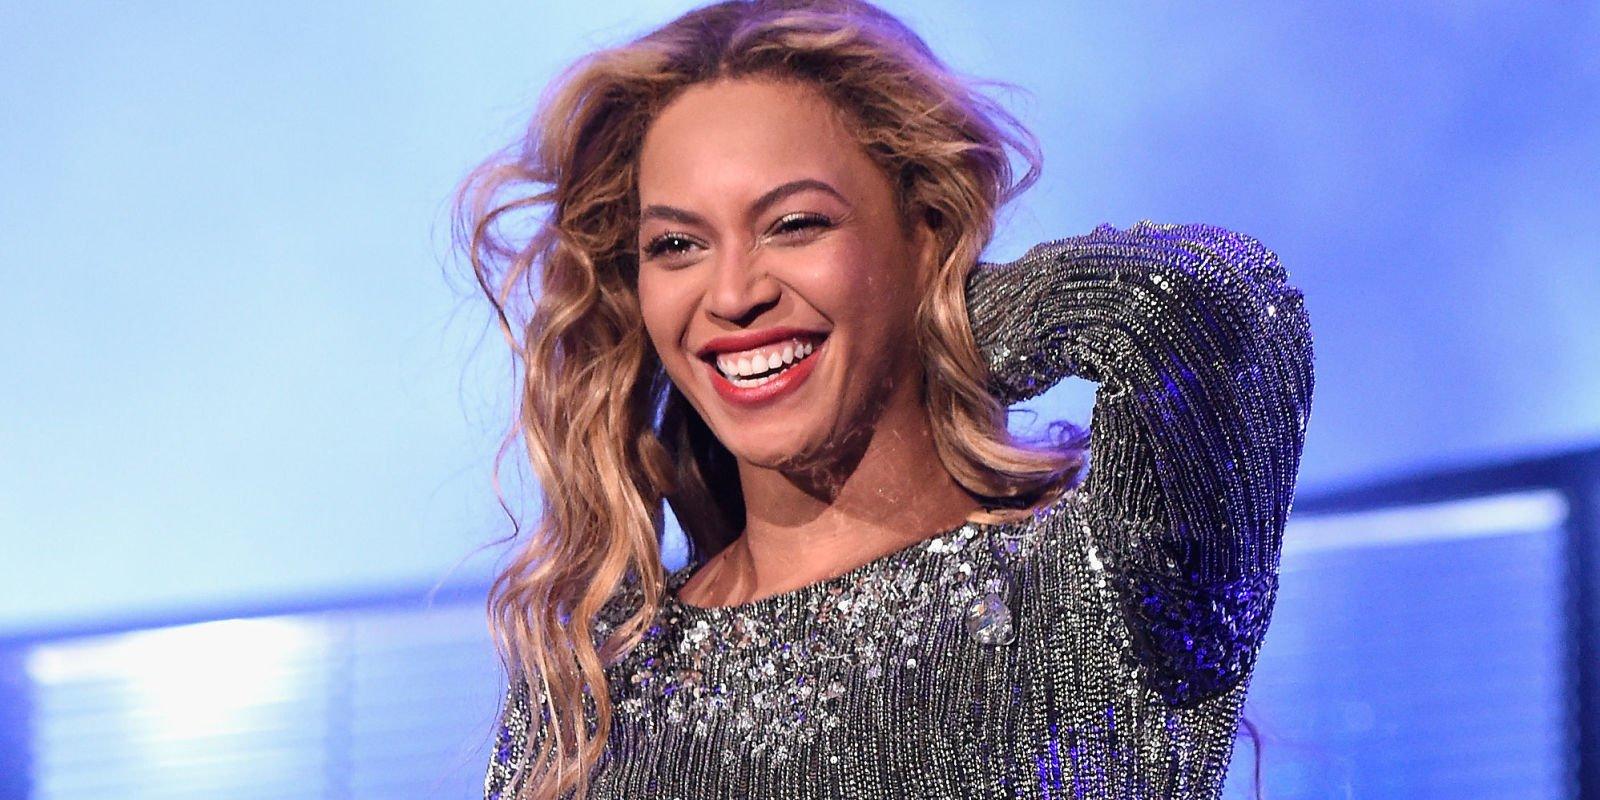 "Beyoncé Did an Amazing ""Lemonade"" Medley at the VMAs https://t.co/h4A5x7rGWy #VMAs https://t.co/gxtpTwesXo"